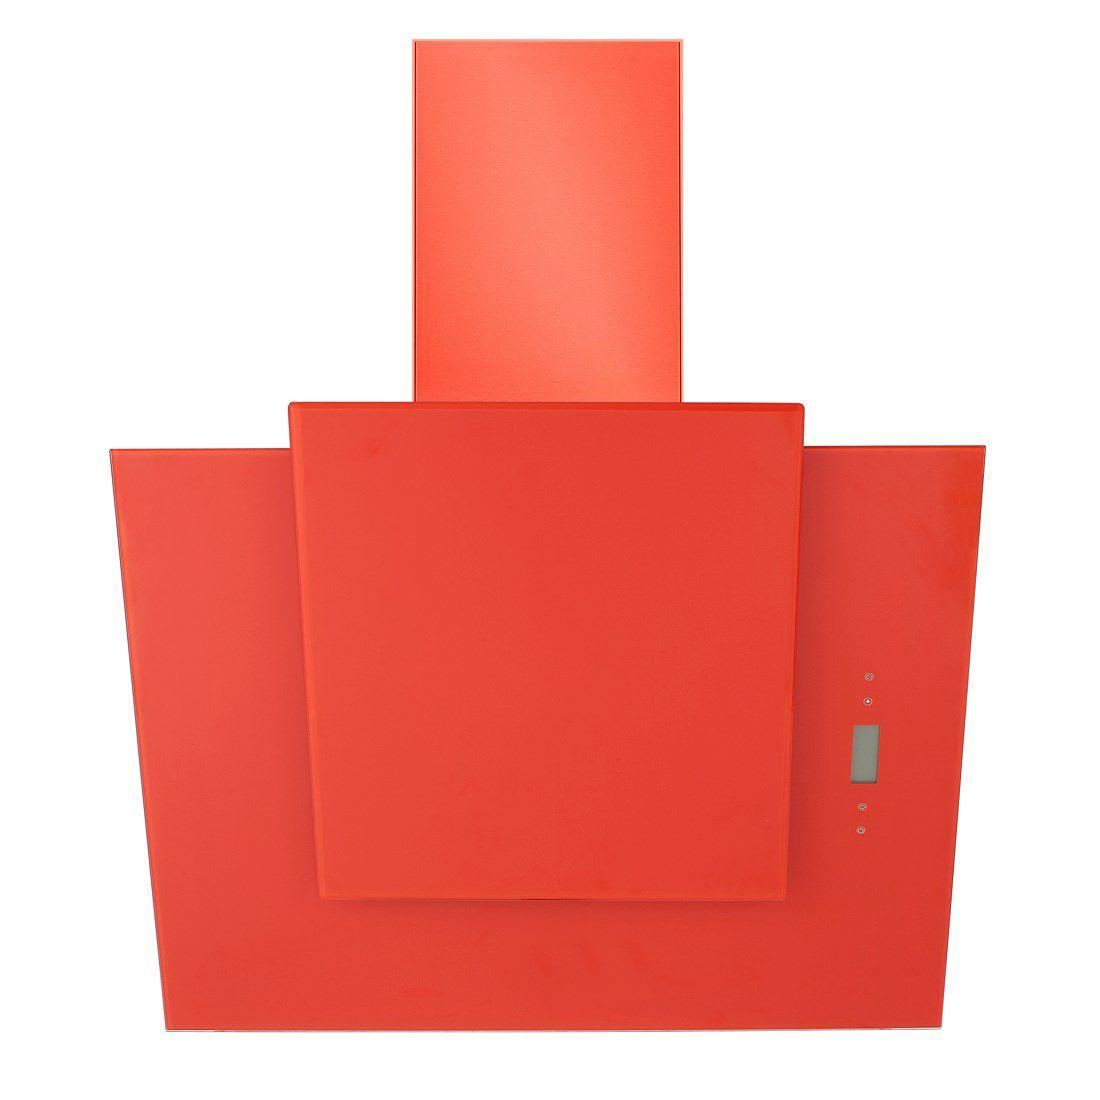 Coifa Elettromec Magma Parede Inox 80cm 220V